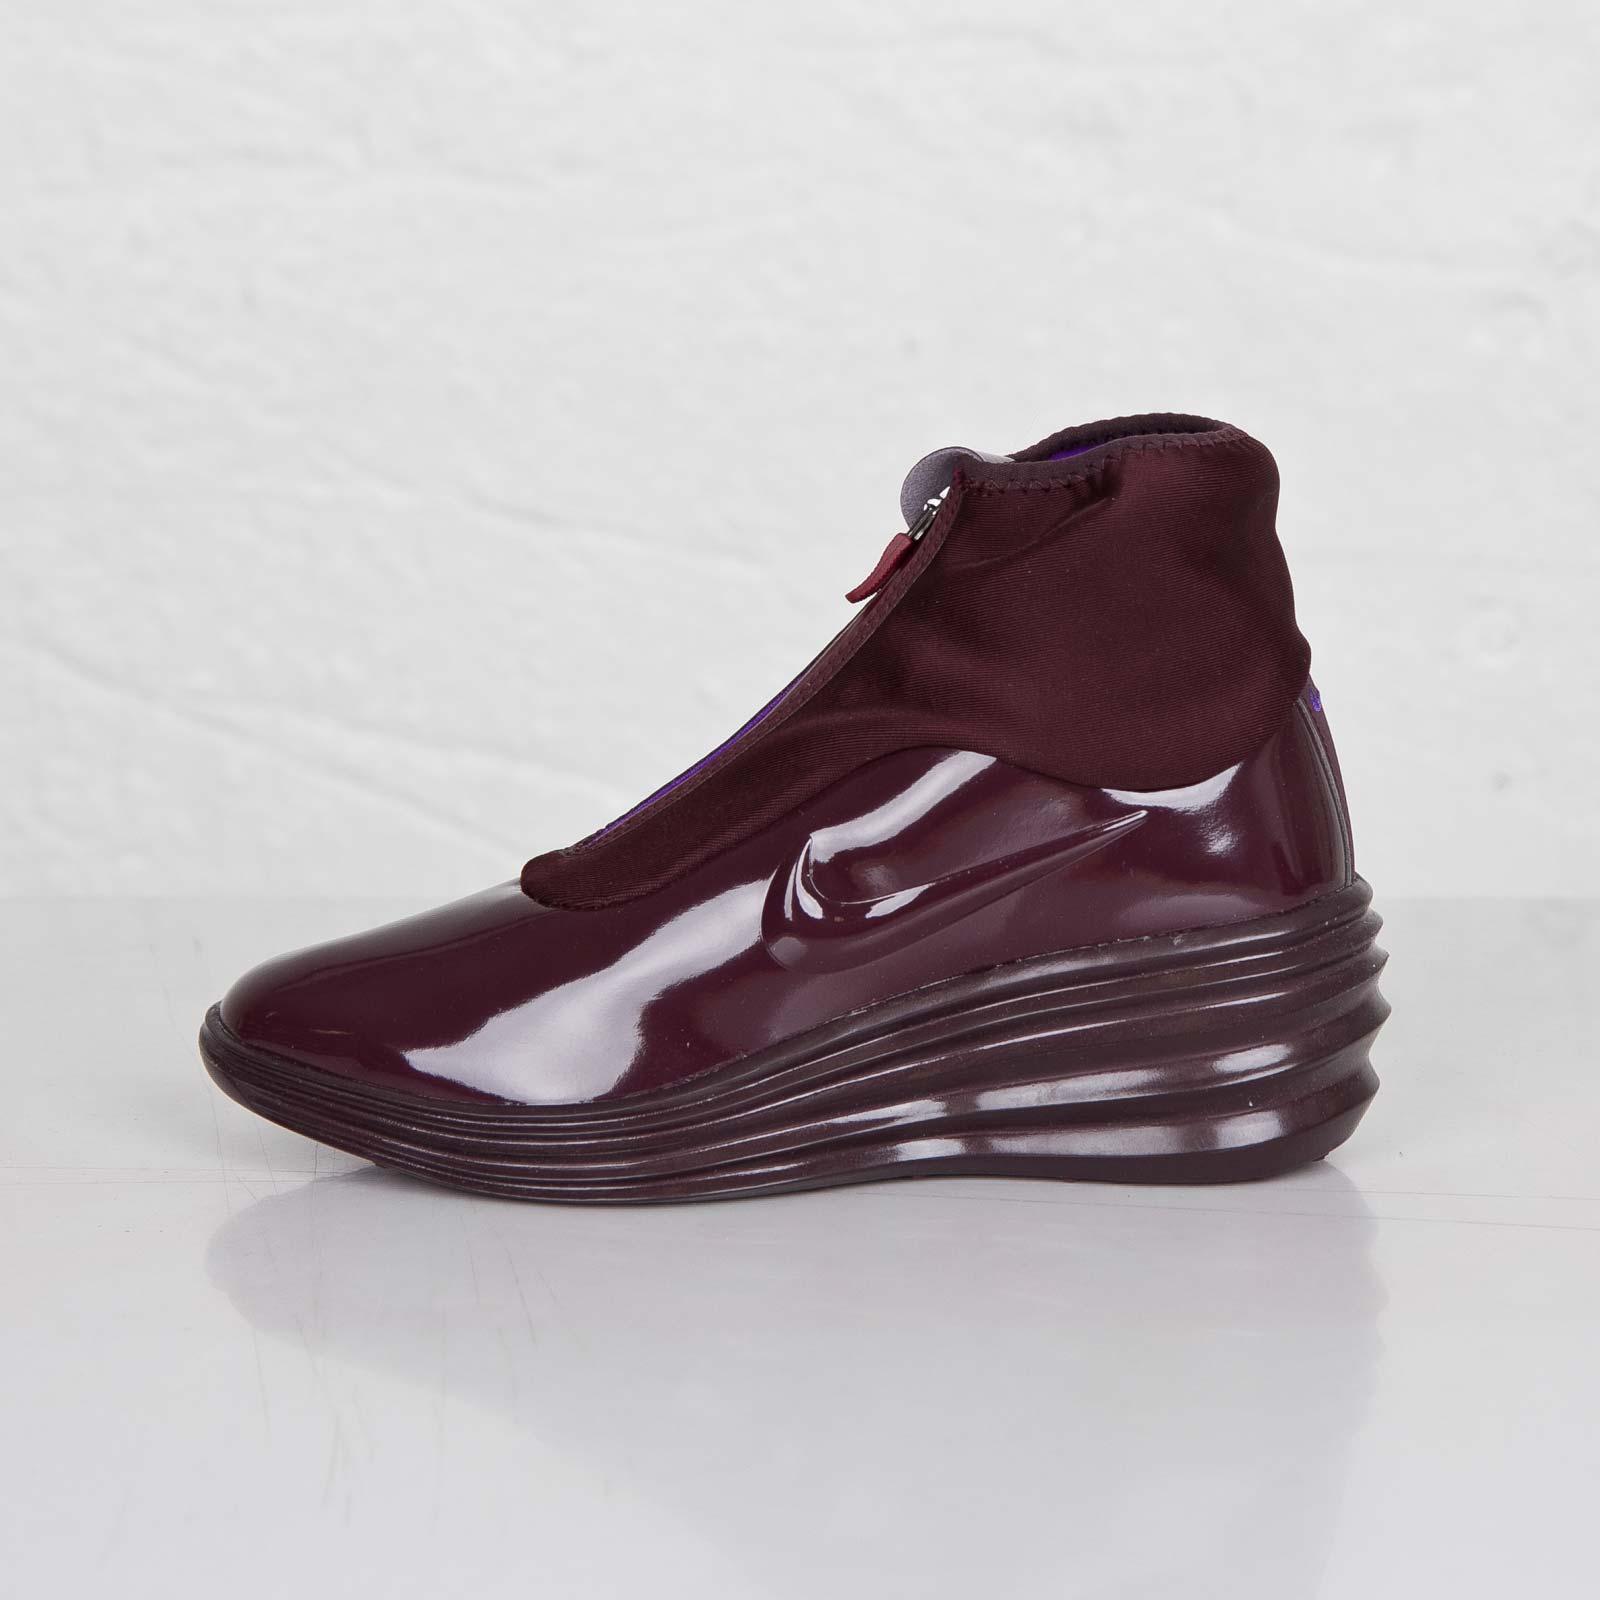 newest caf7f a684a ... where can i buy nike wmns lunarelite sky hi sneakerboot 7e546 8273c